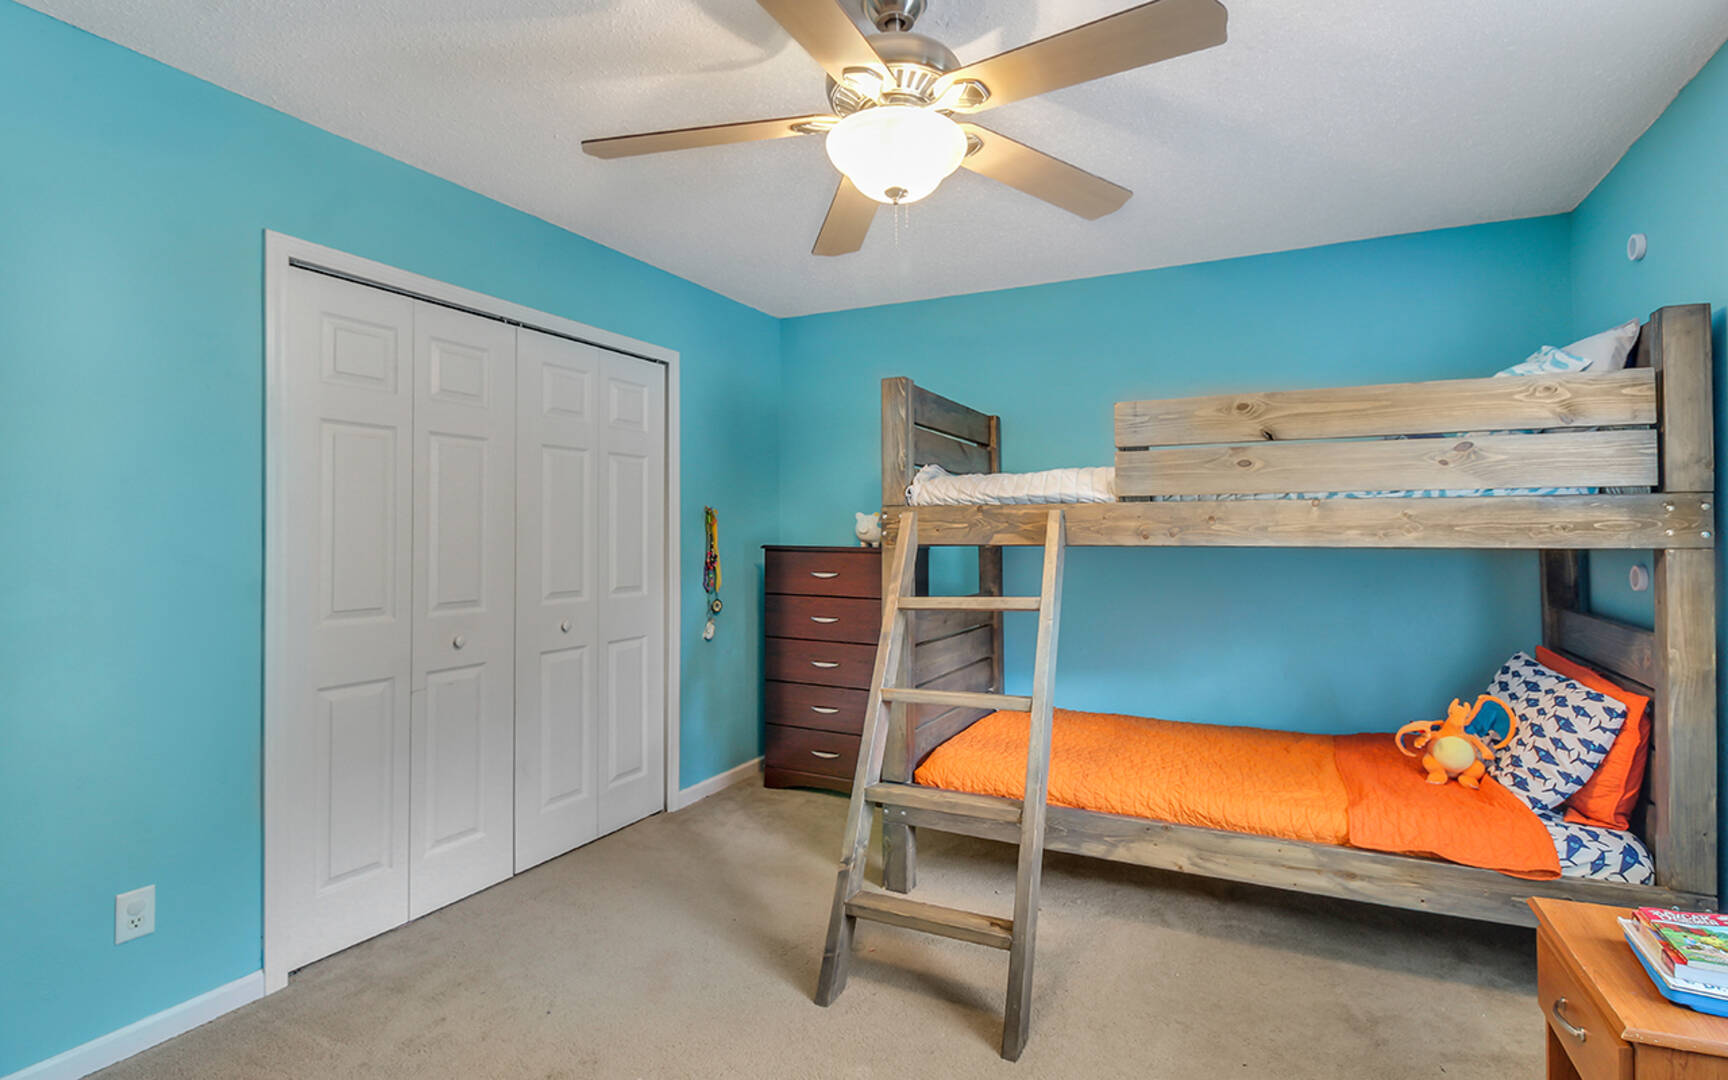 131 Wax Mrytle Court Savannah, GA 31419